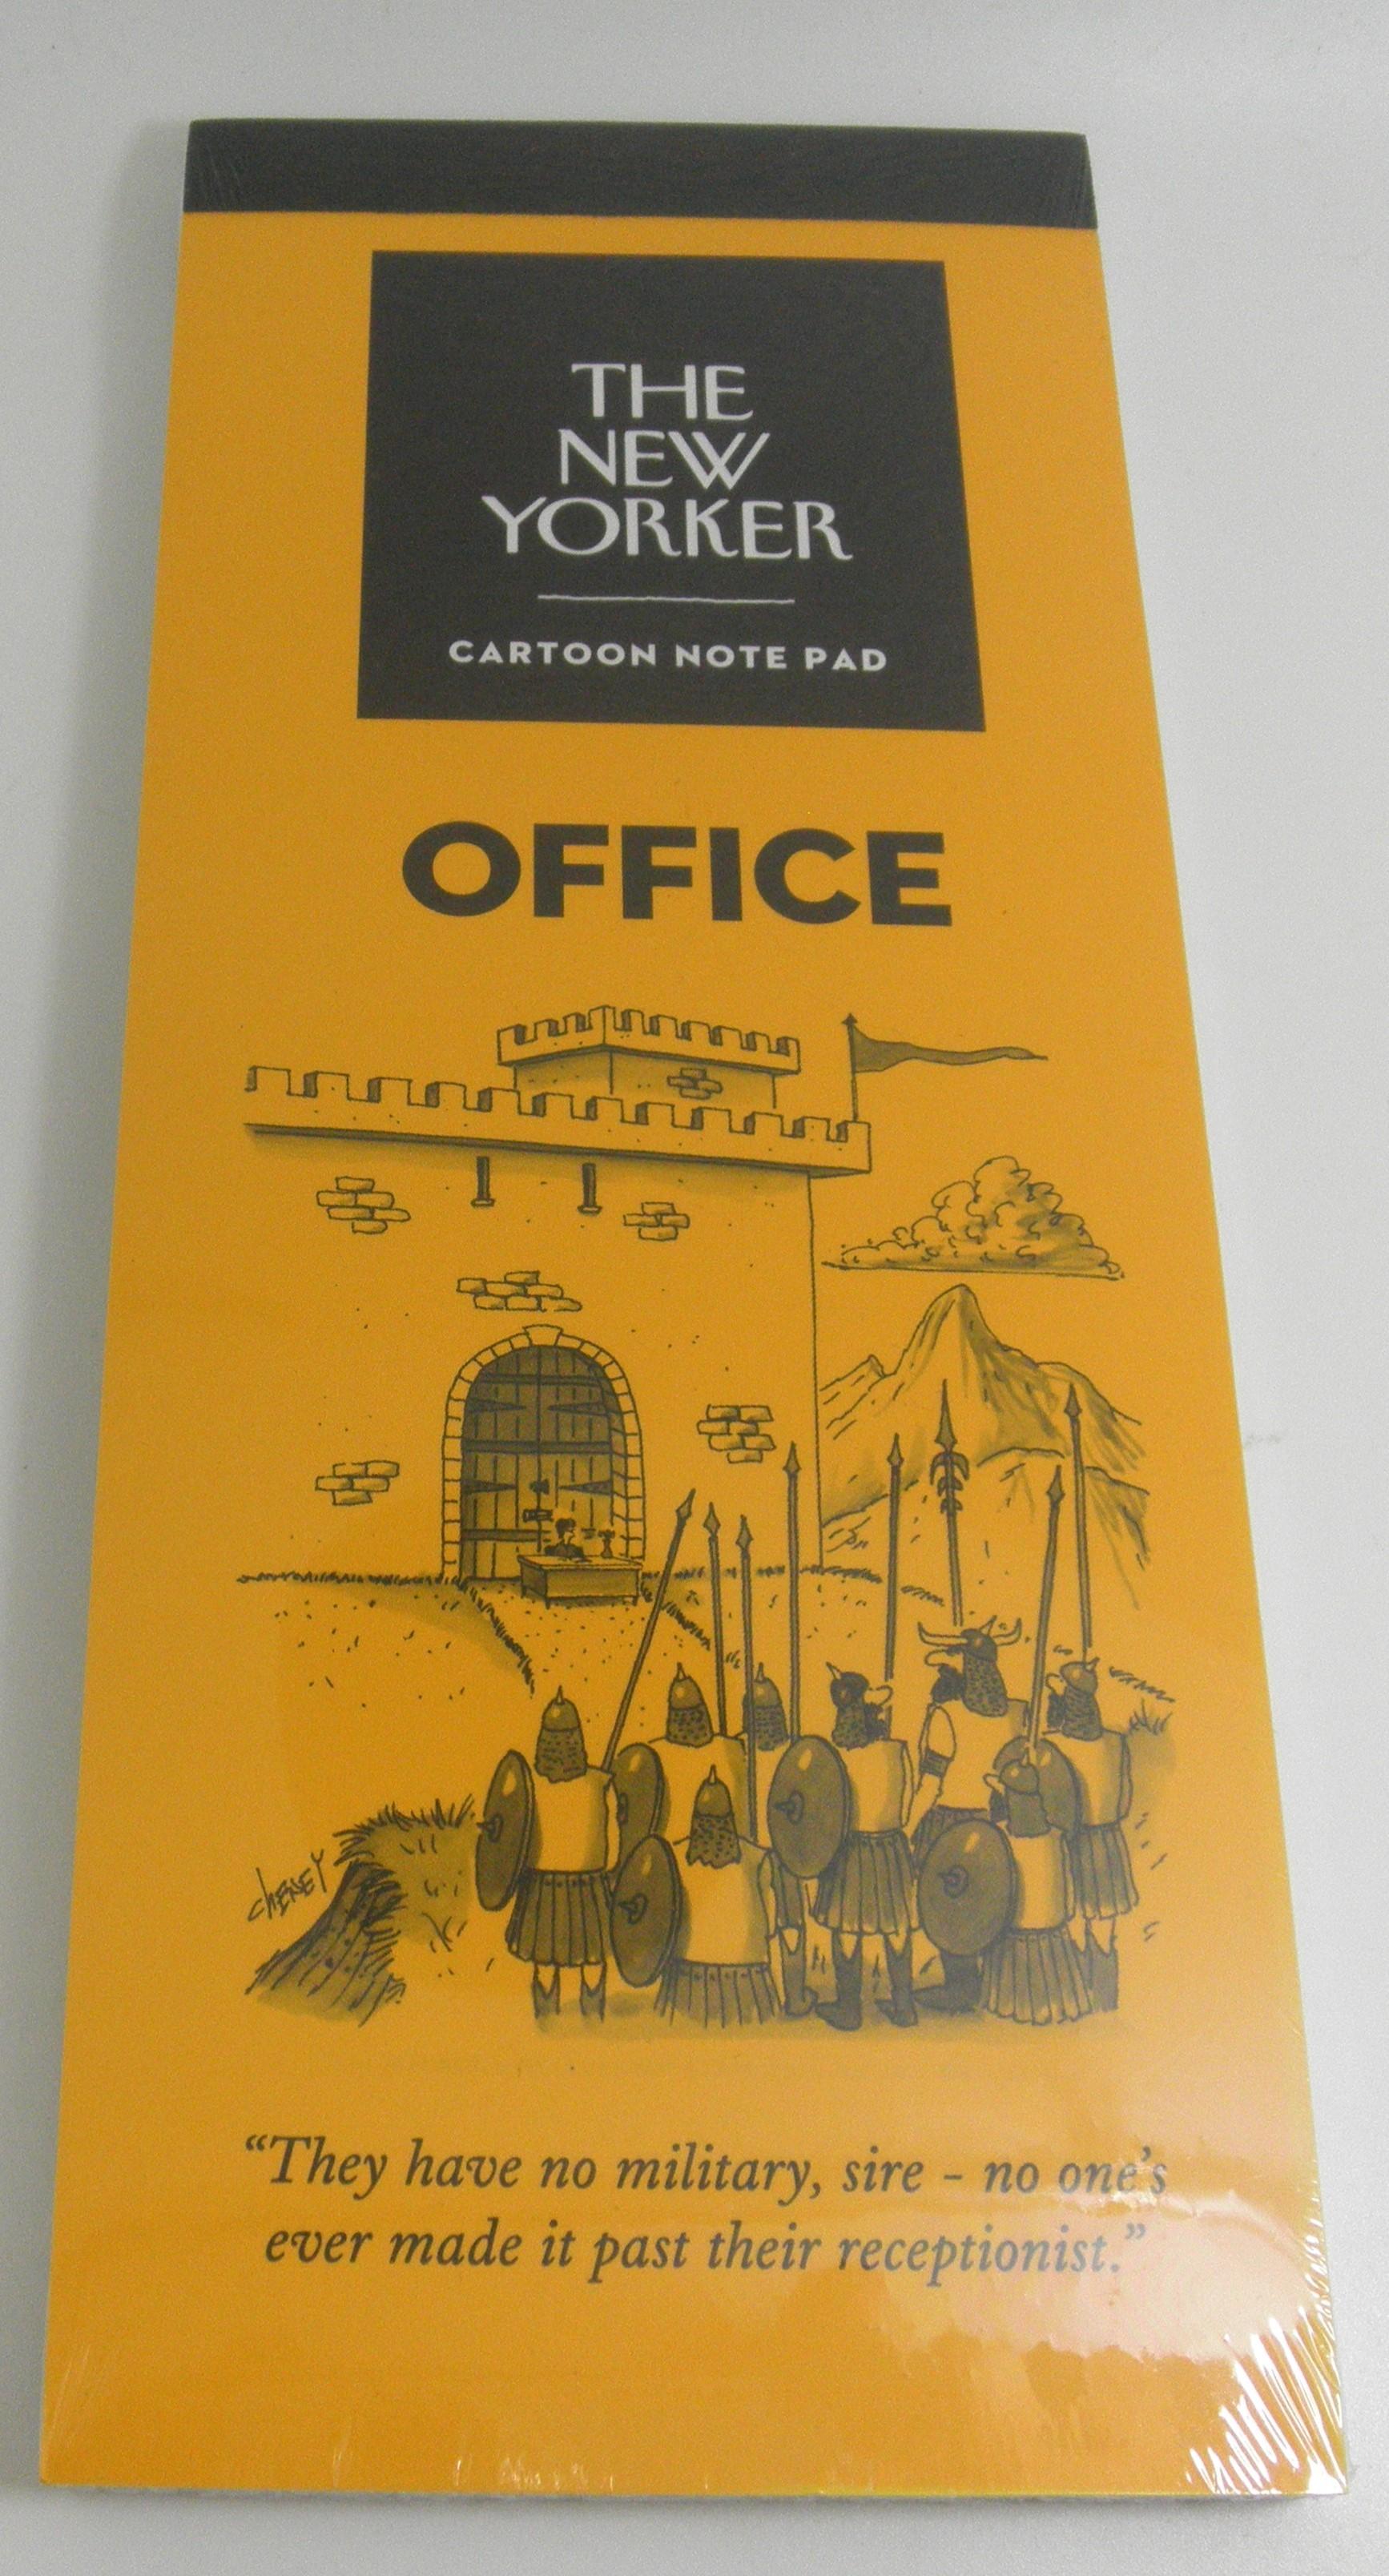 The New Yorker Cartoon Notepad Office